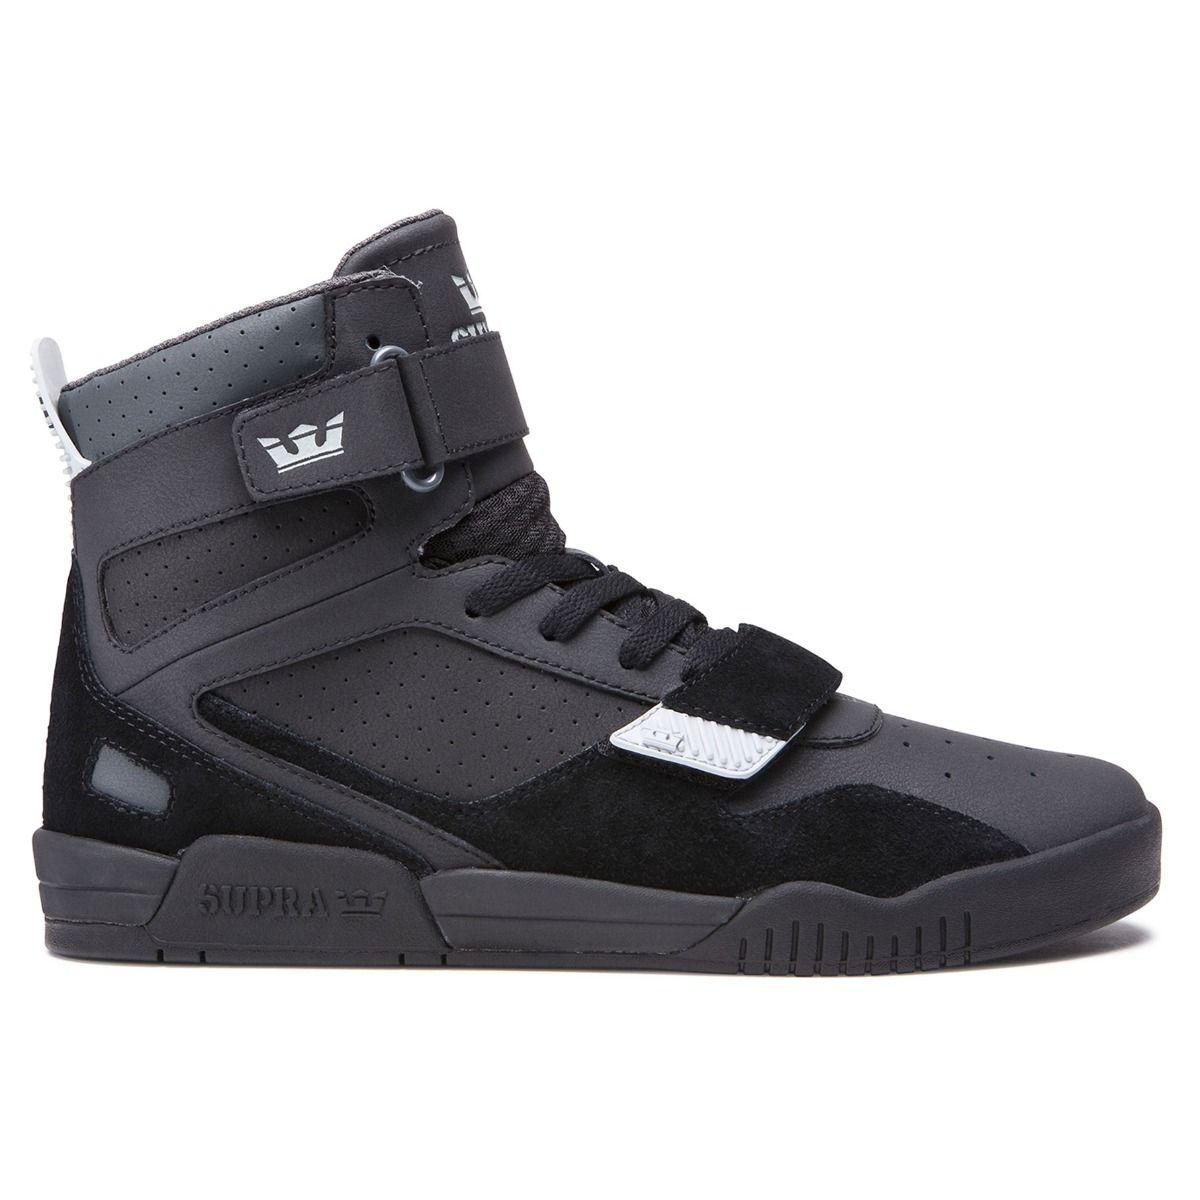 Supra Breaker Shoes - Black / Light